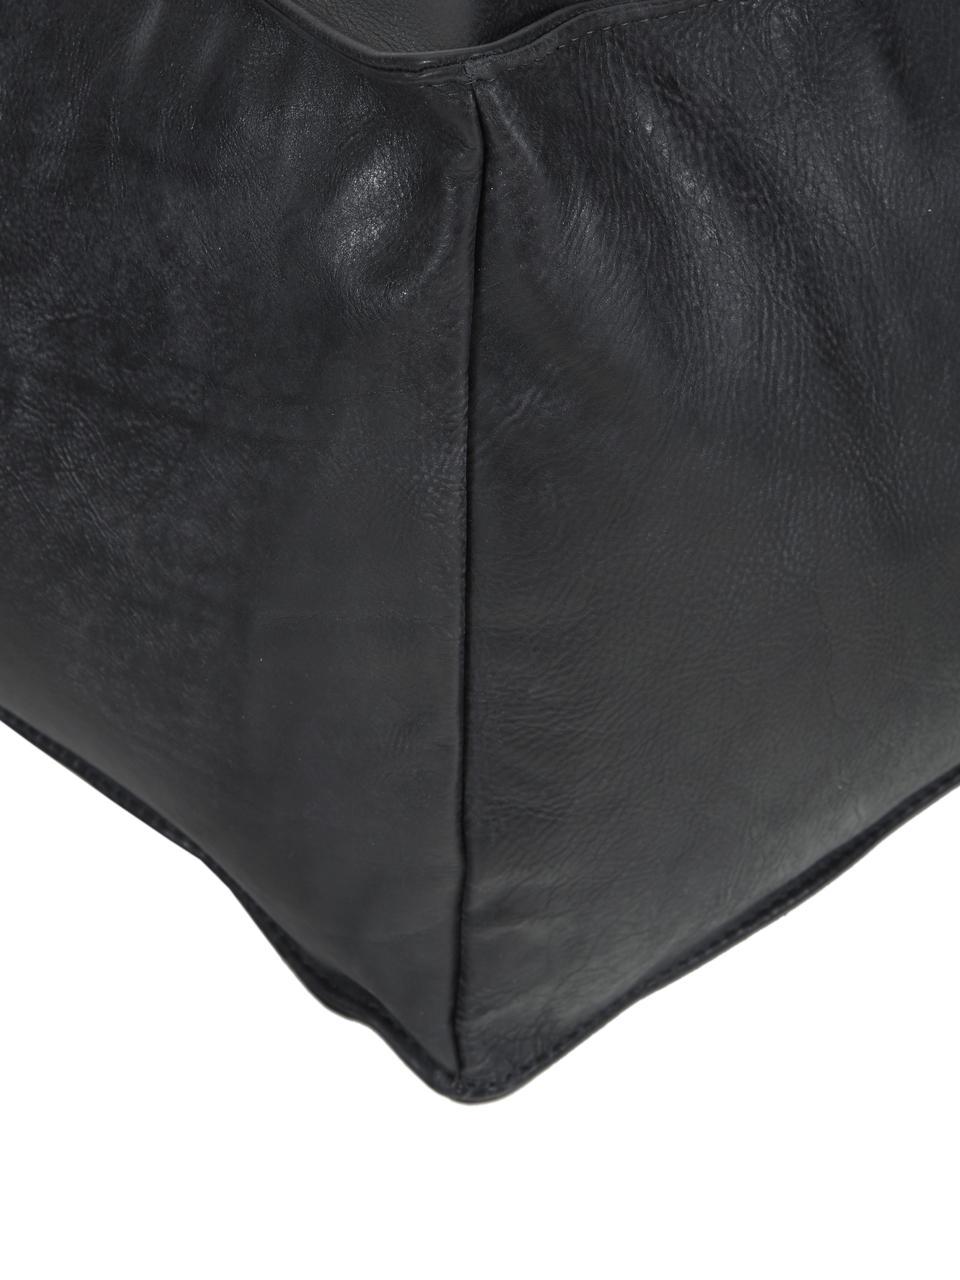 Lederpouf Porthos, Bezug: 100% Anilinleder, Schwarz, 80 x 33 cm